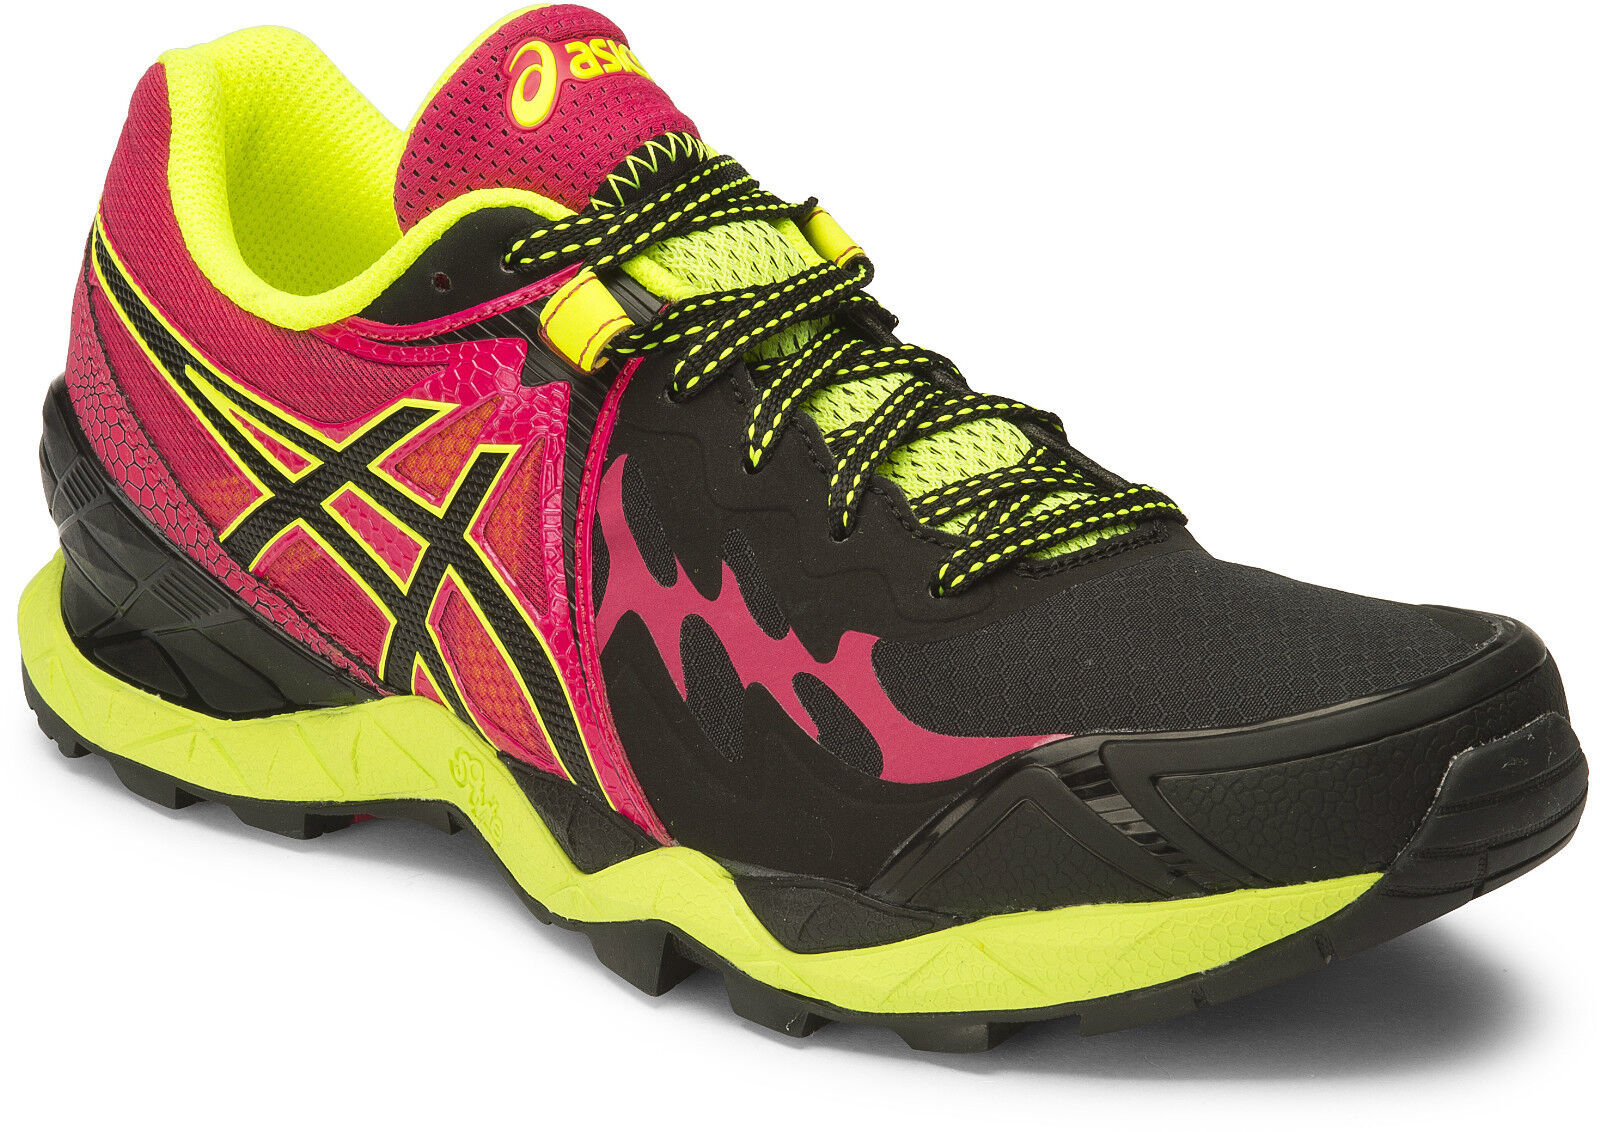 Asics Gel Fuji Endurance Plasmashield Womens Trail Shoes Price reduction Price reduction best-selling model of the brand